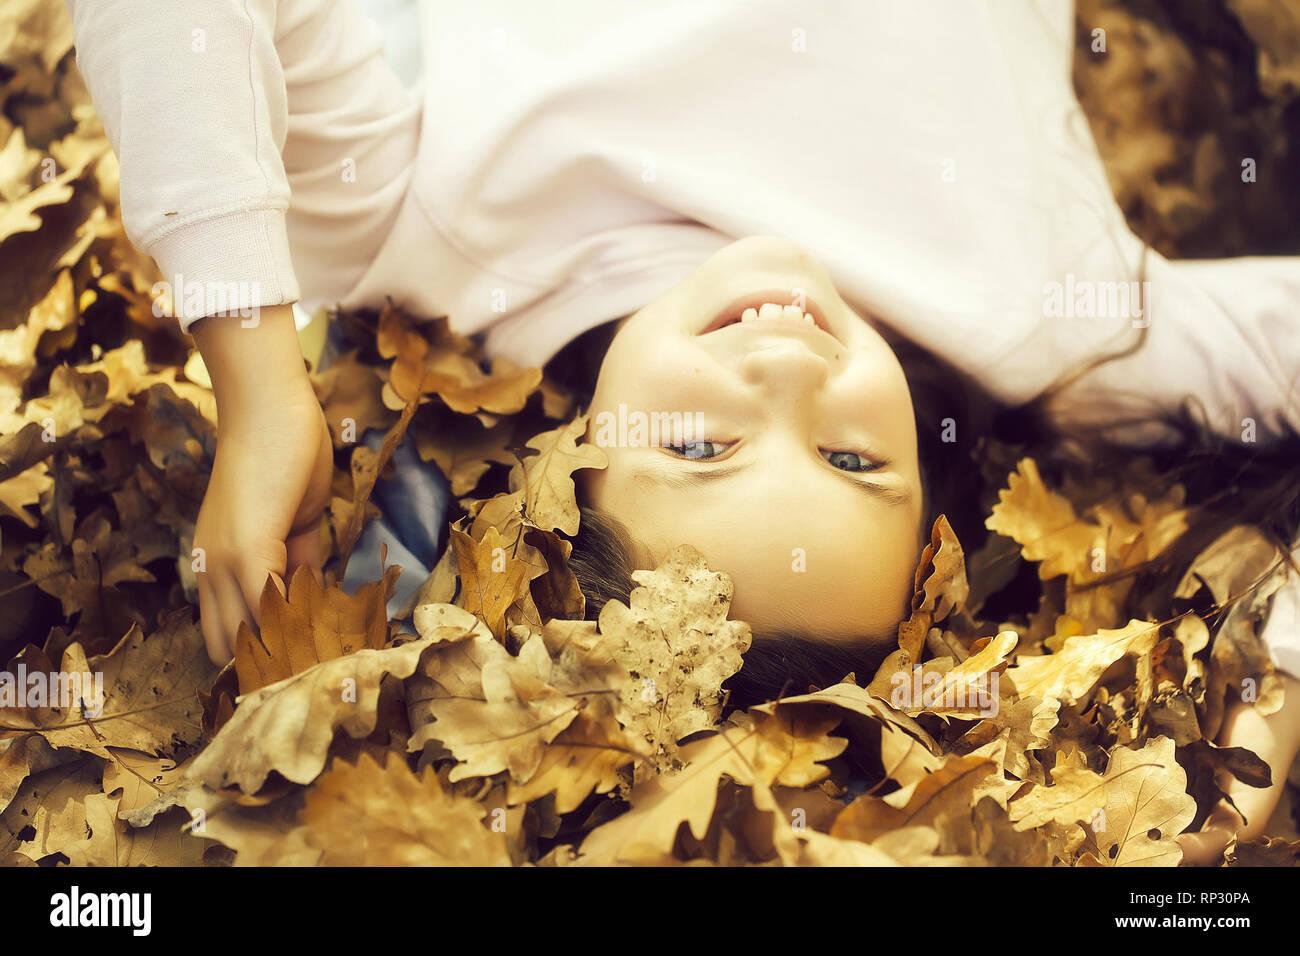 Adorable school age girl child - Stock Image